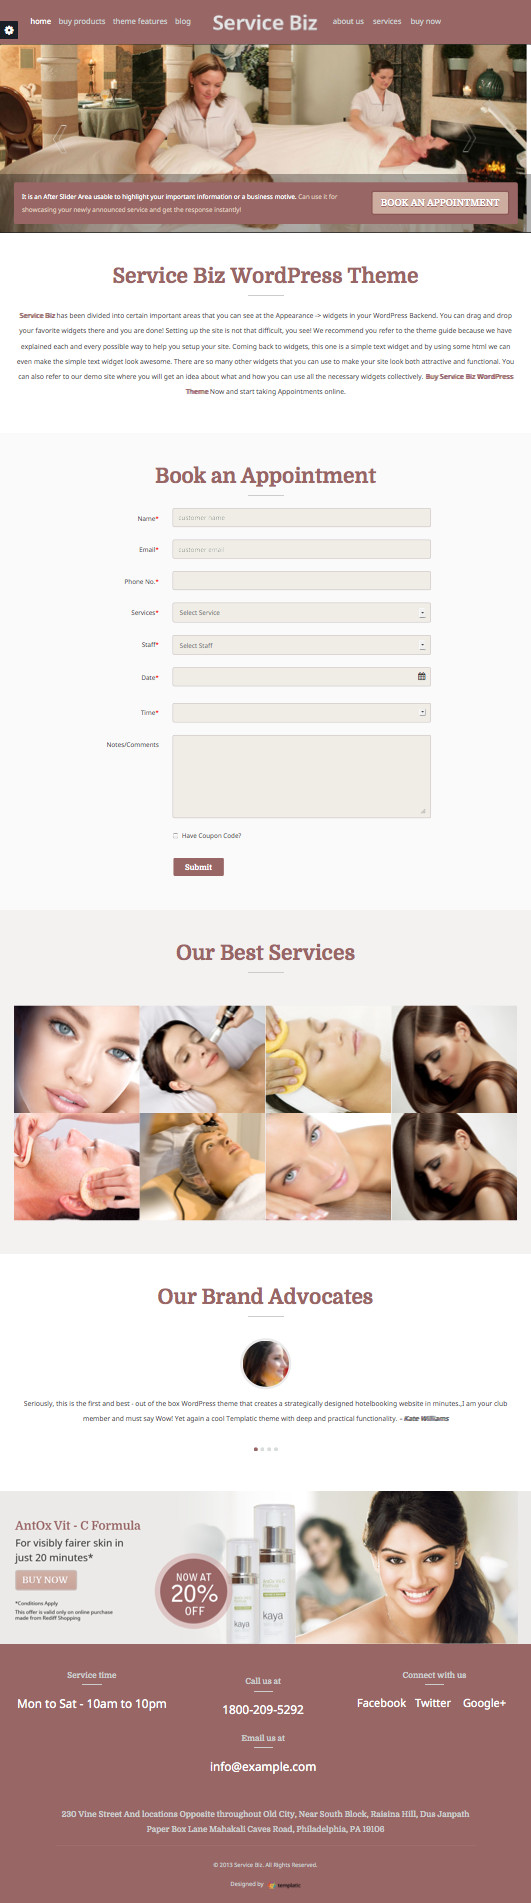 Service Biz WordPress Online Appointment Booking Theme